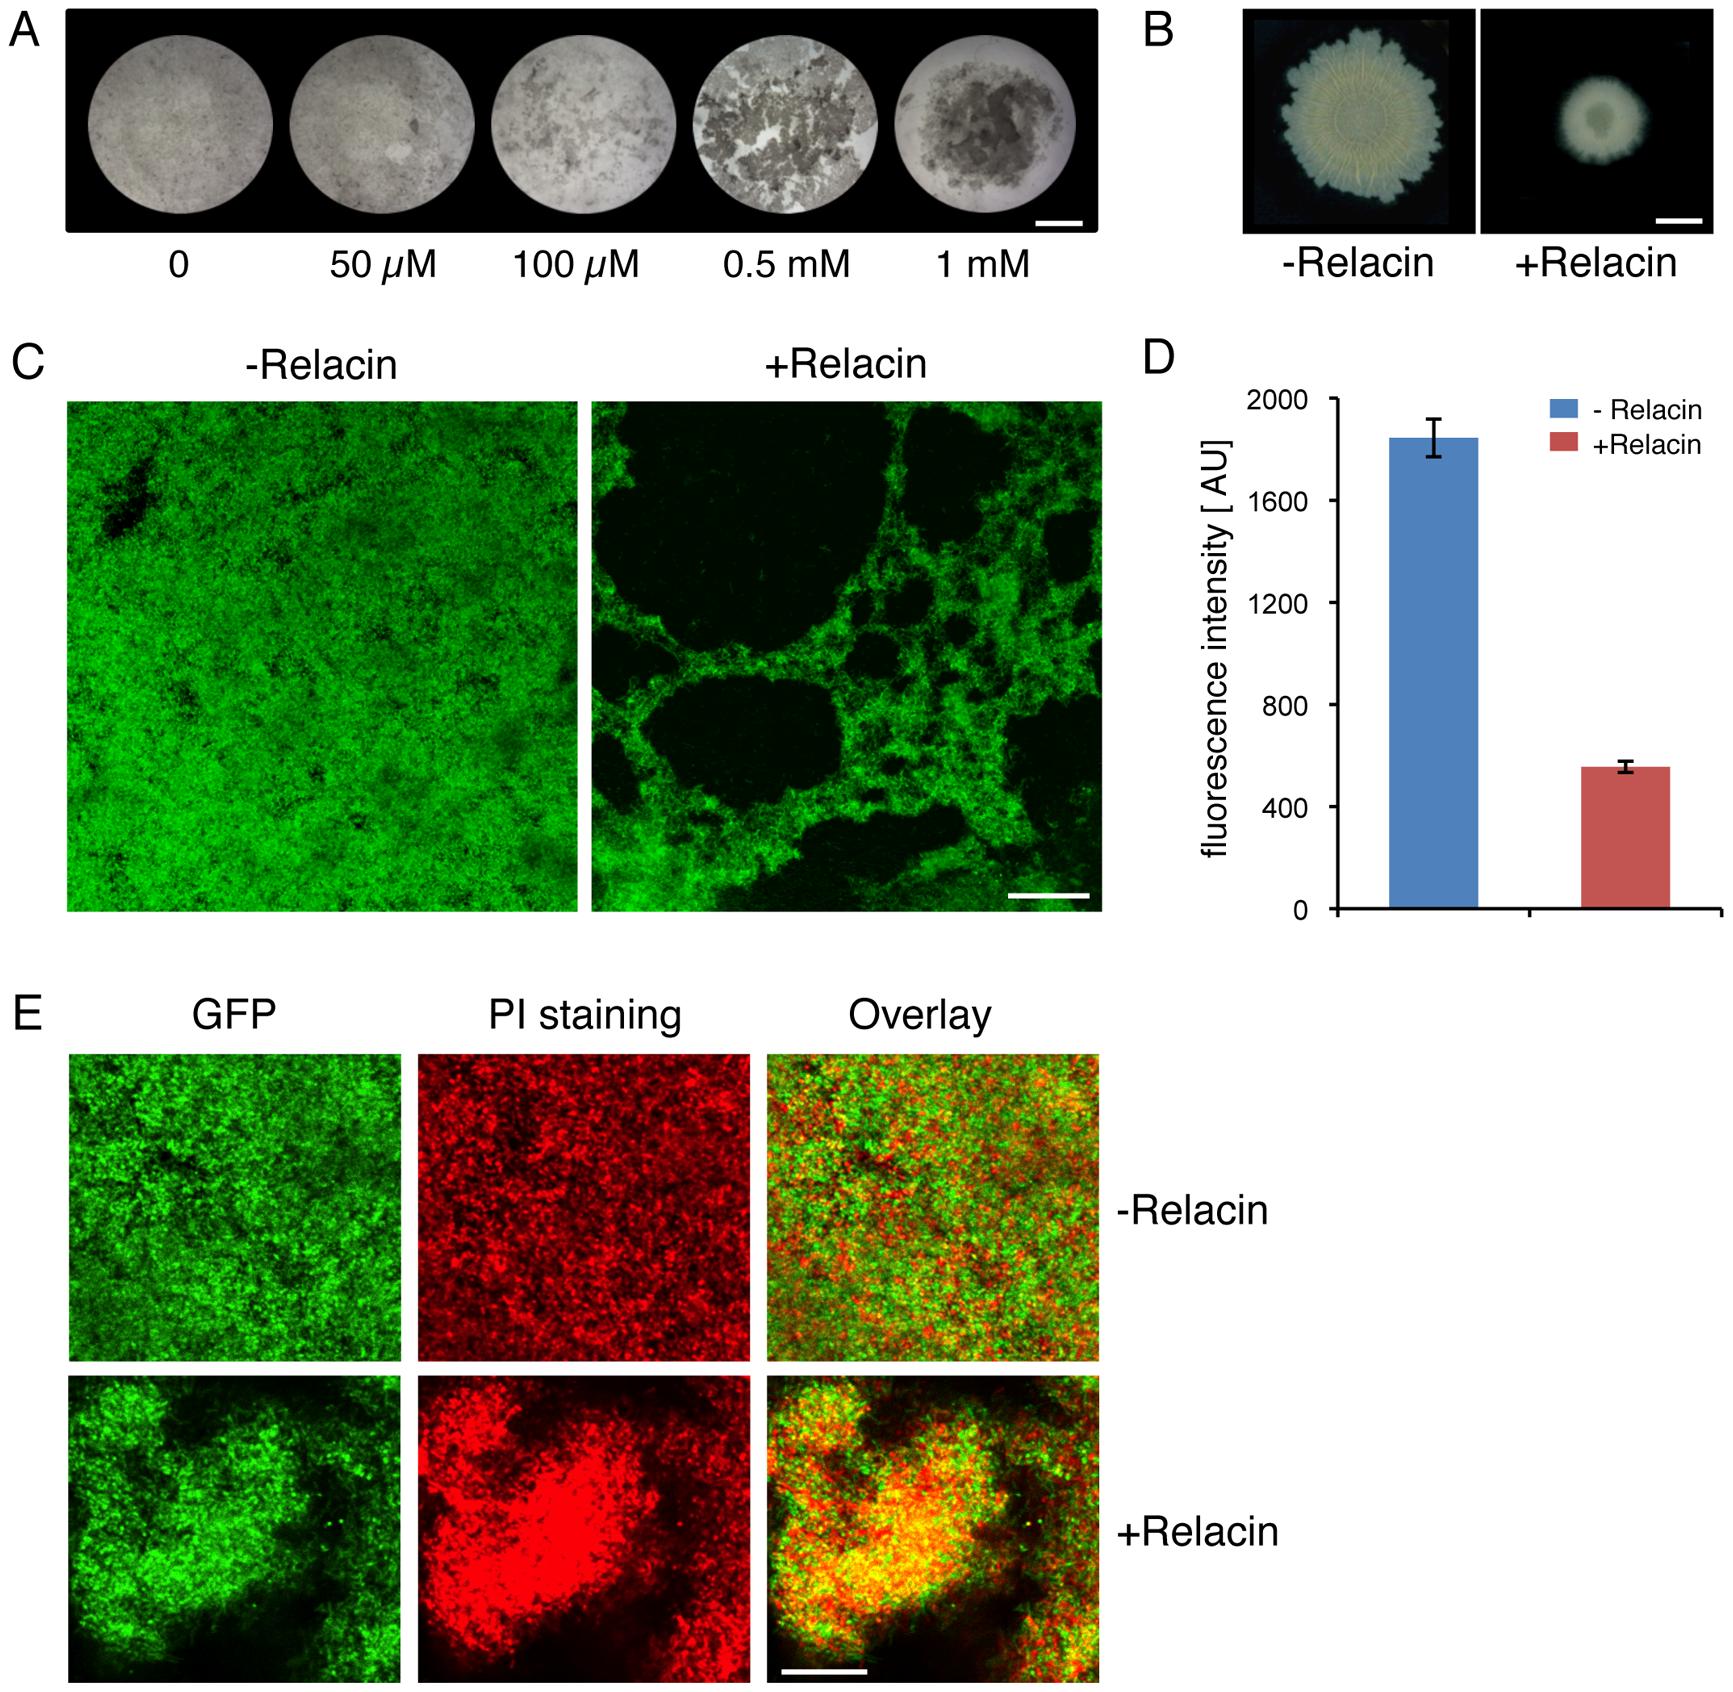 Relacin affects biofilm formation in <i>Bacillus subtilis.</i>